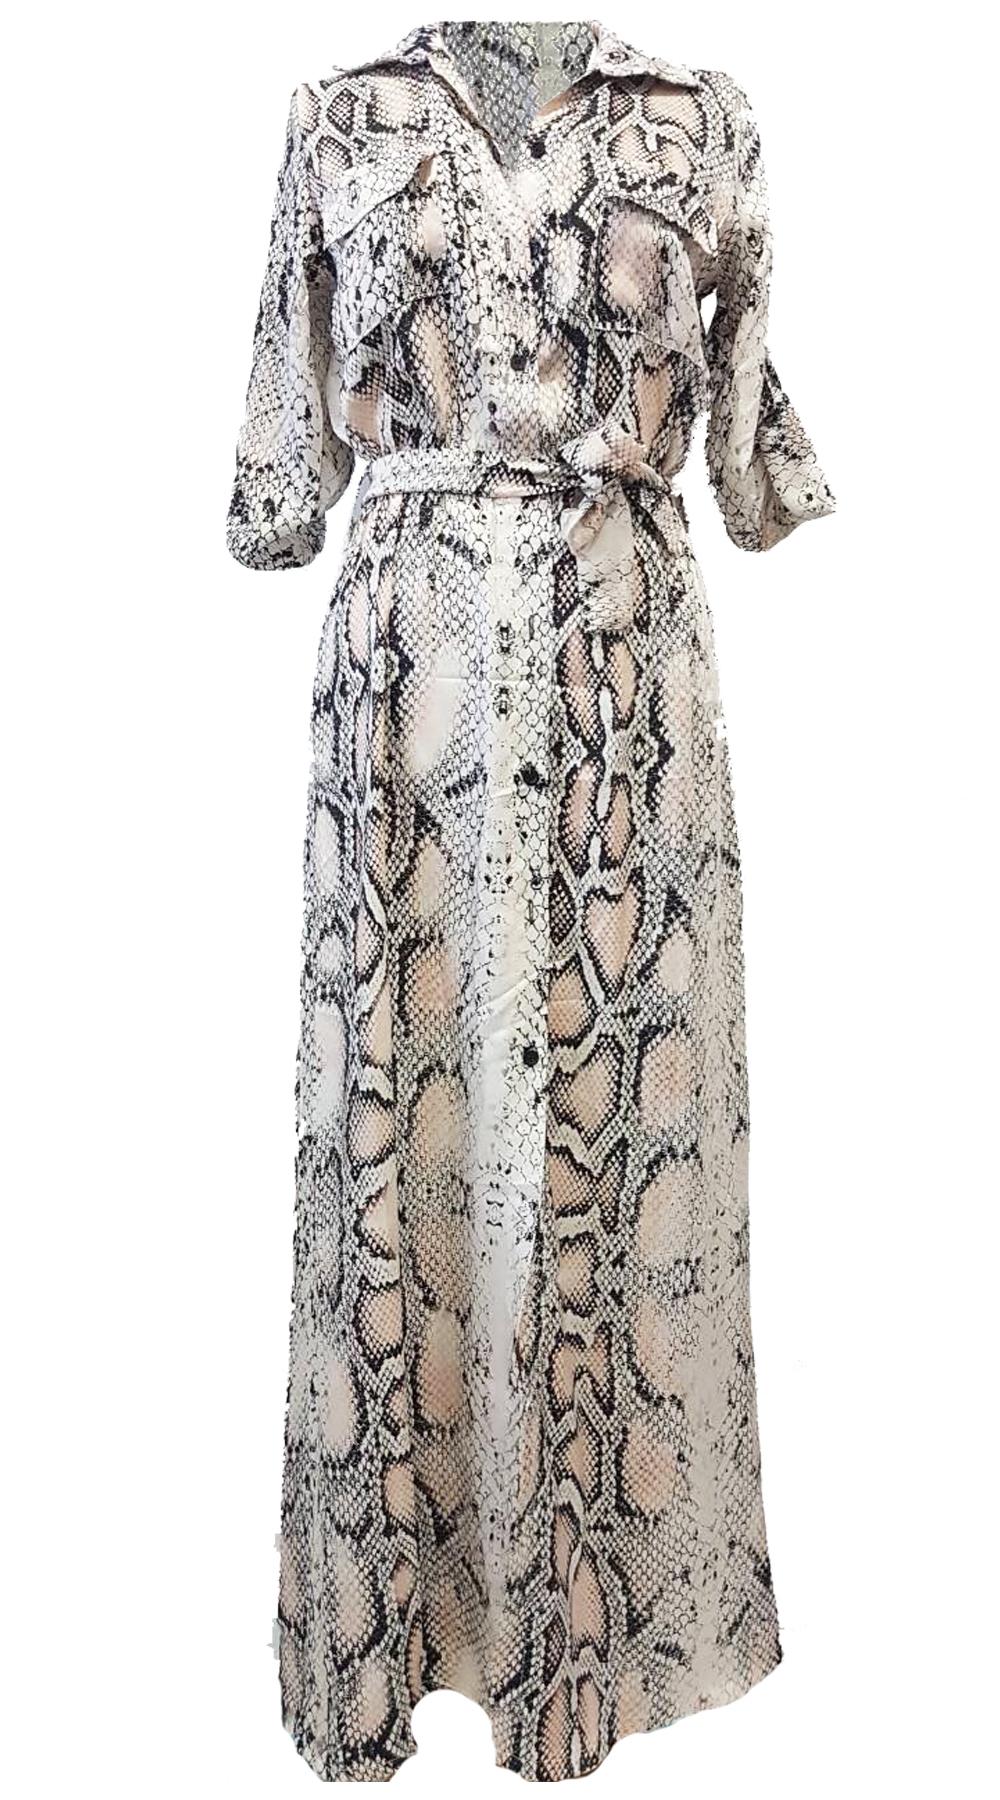 Snake Print Σατινέ Maxi Πουκάμισο-Φόρεμα - MissReina - FA18GAL-50202 animal prints animal prints